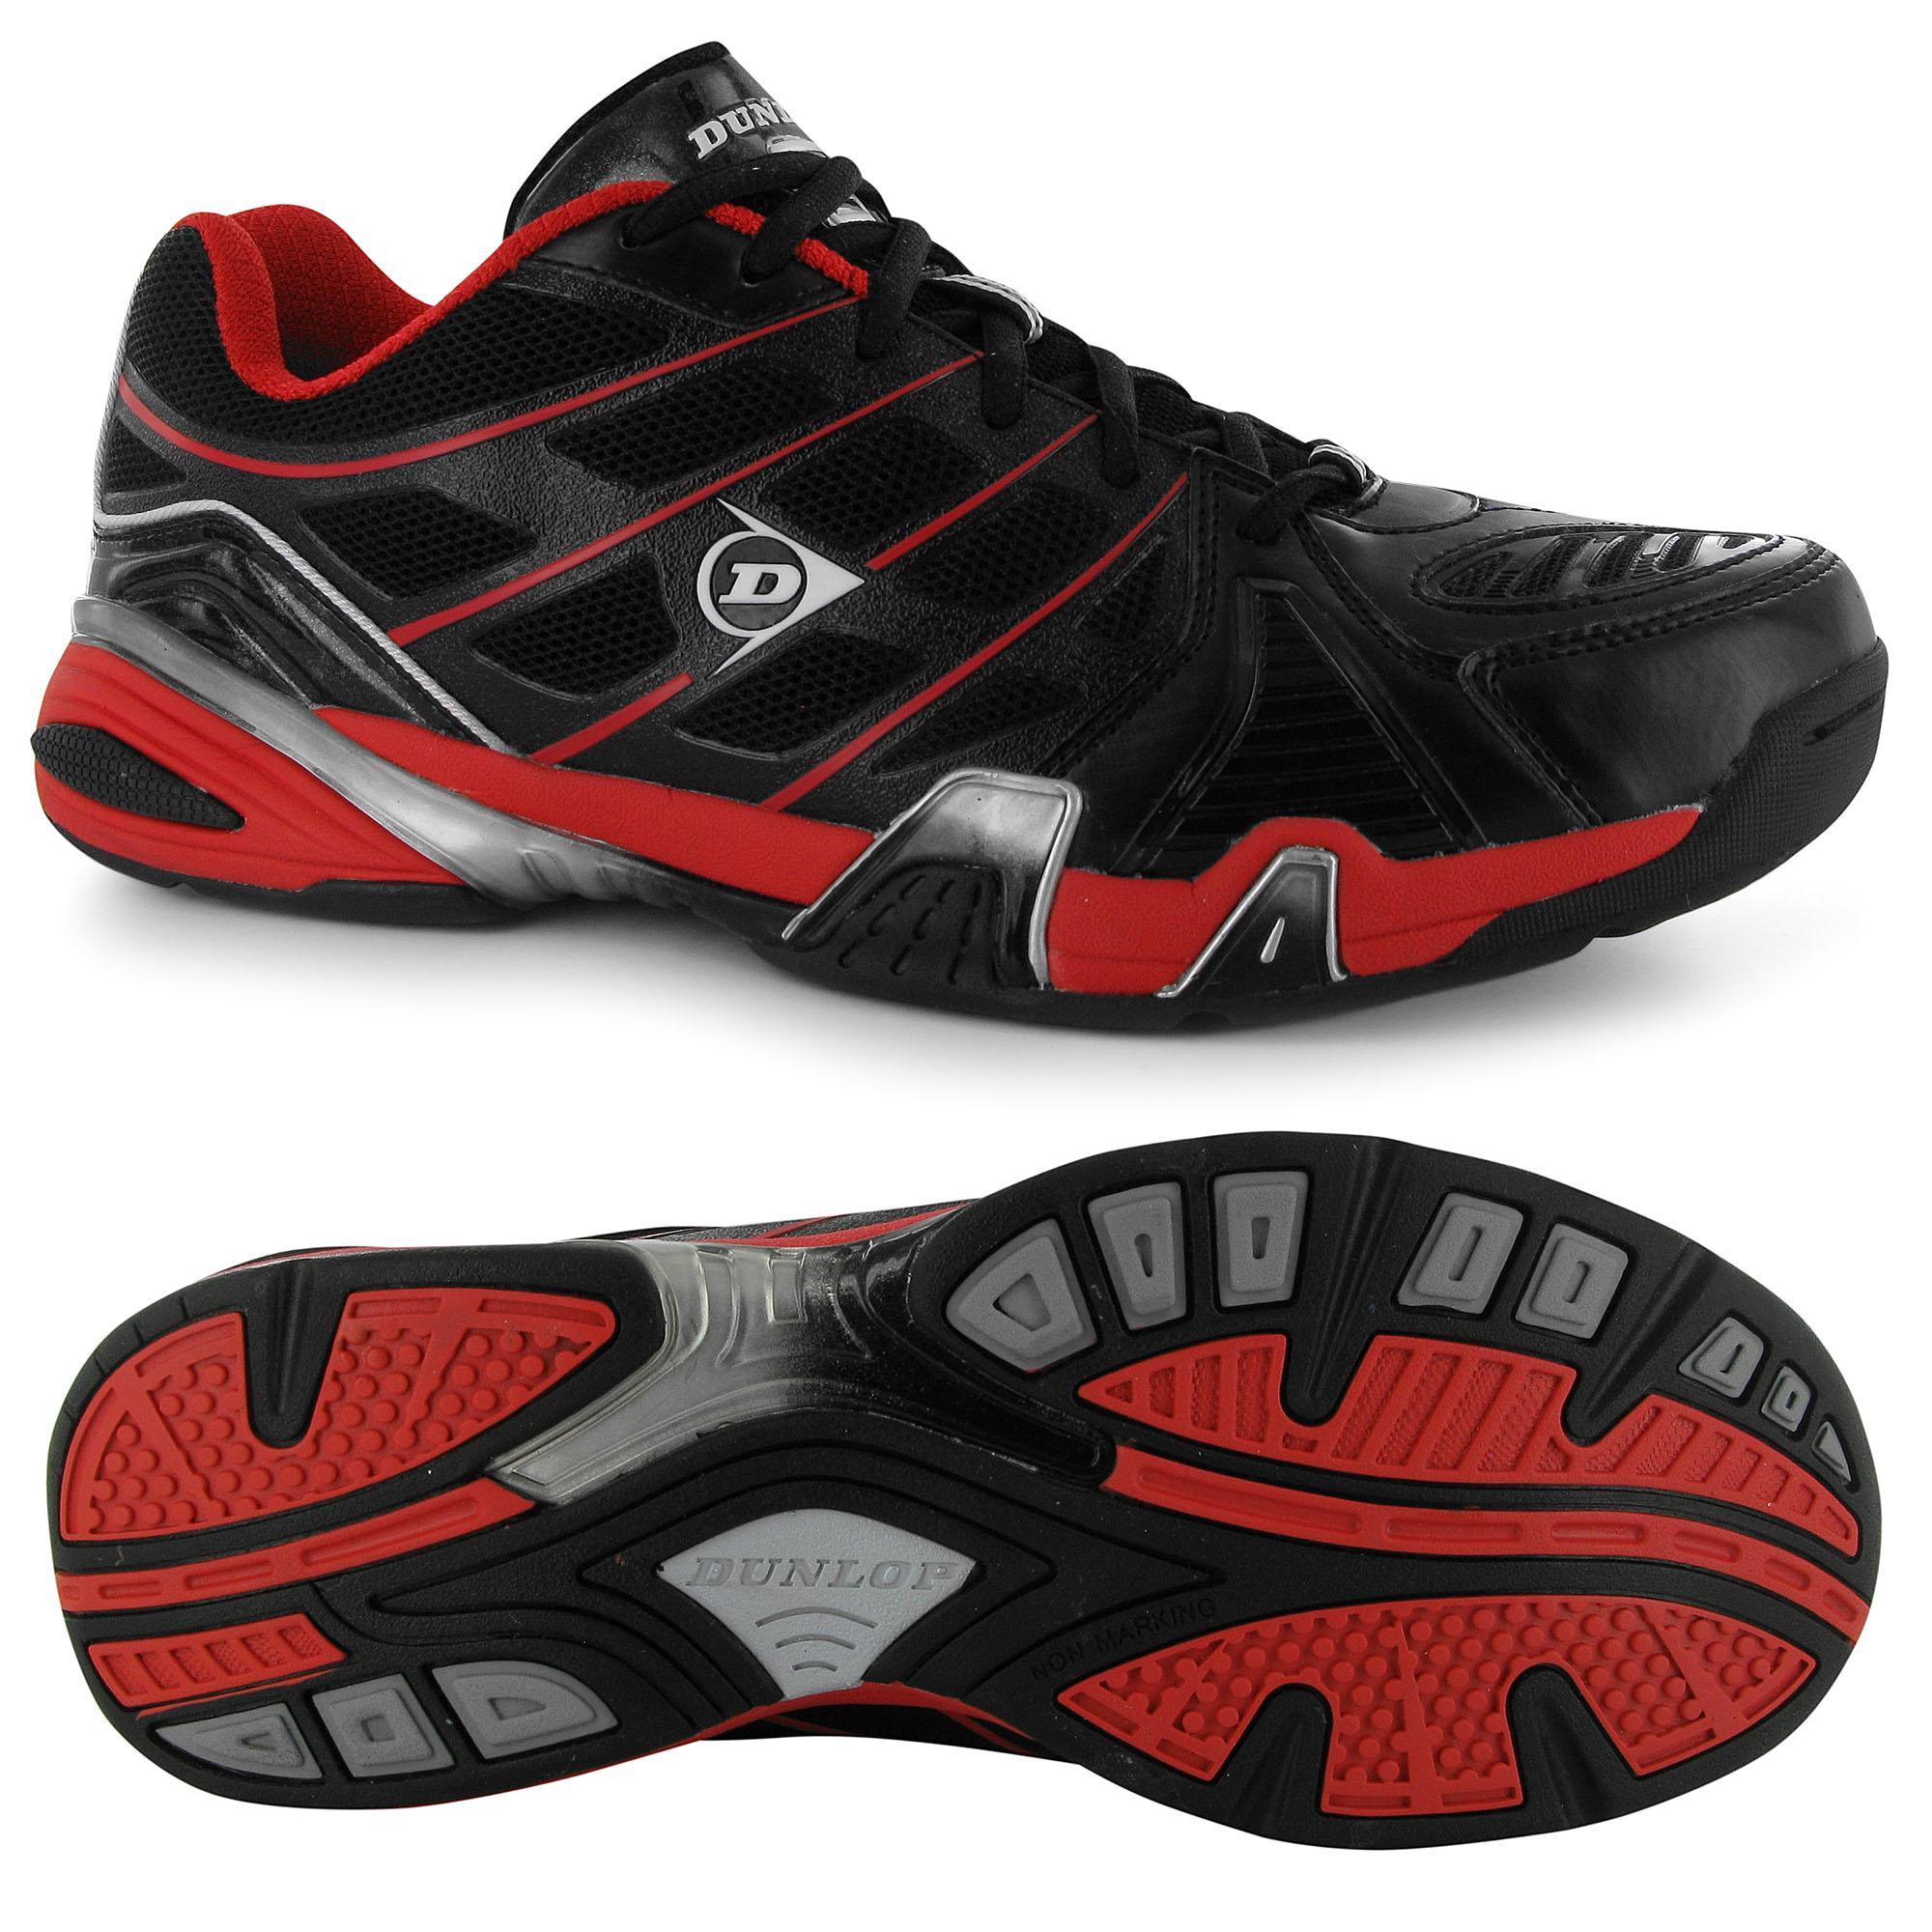 Dunlop Rapid Inferno Mens Court Shoes